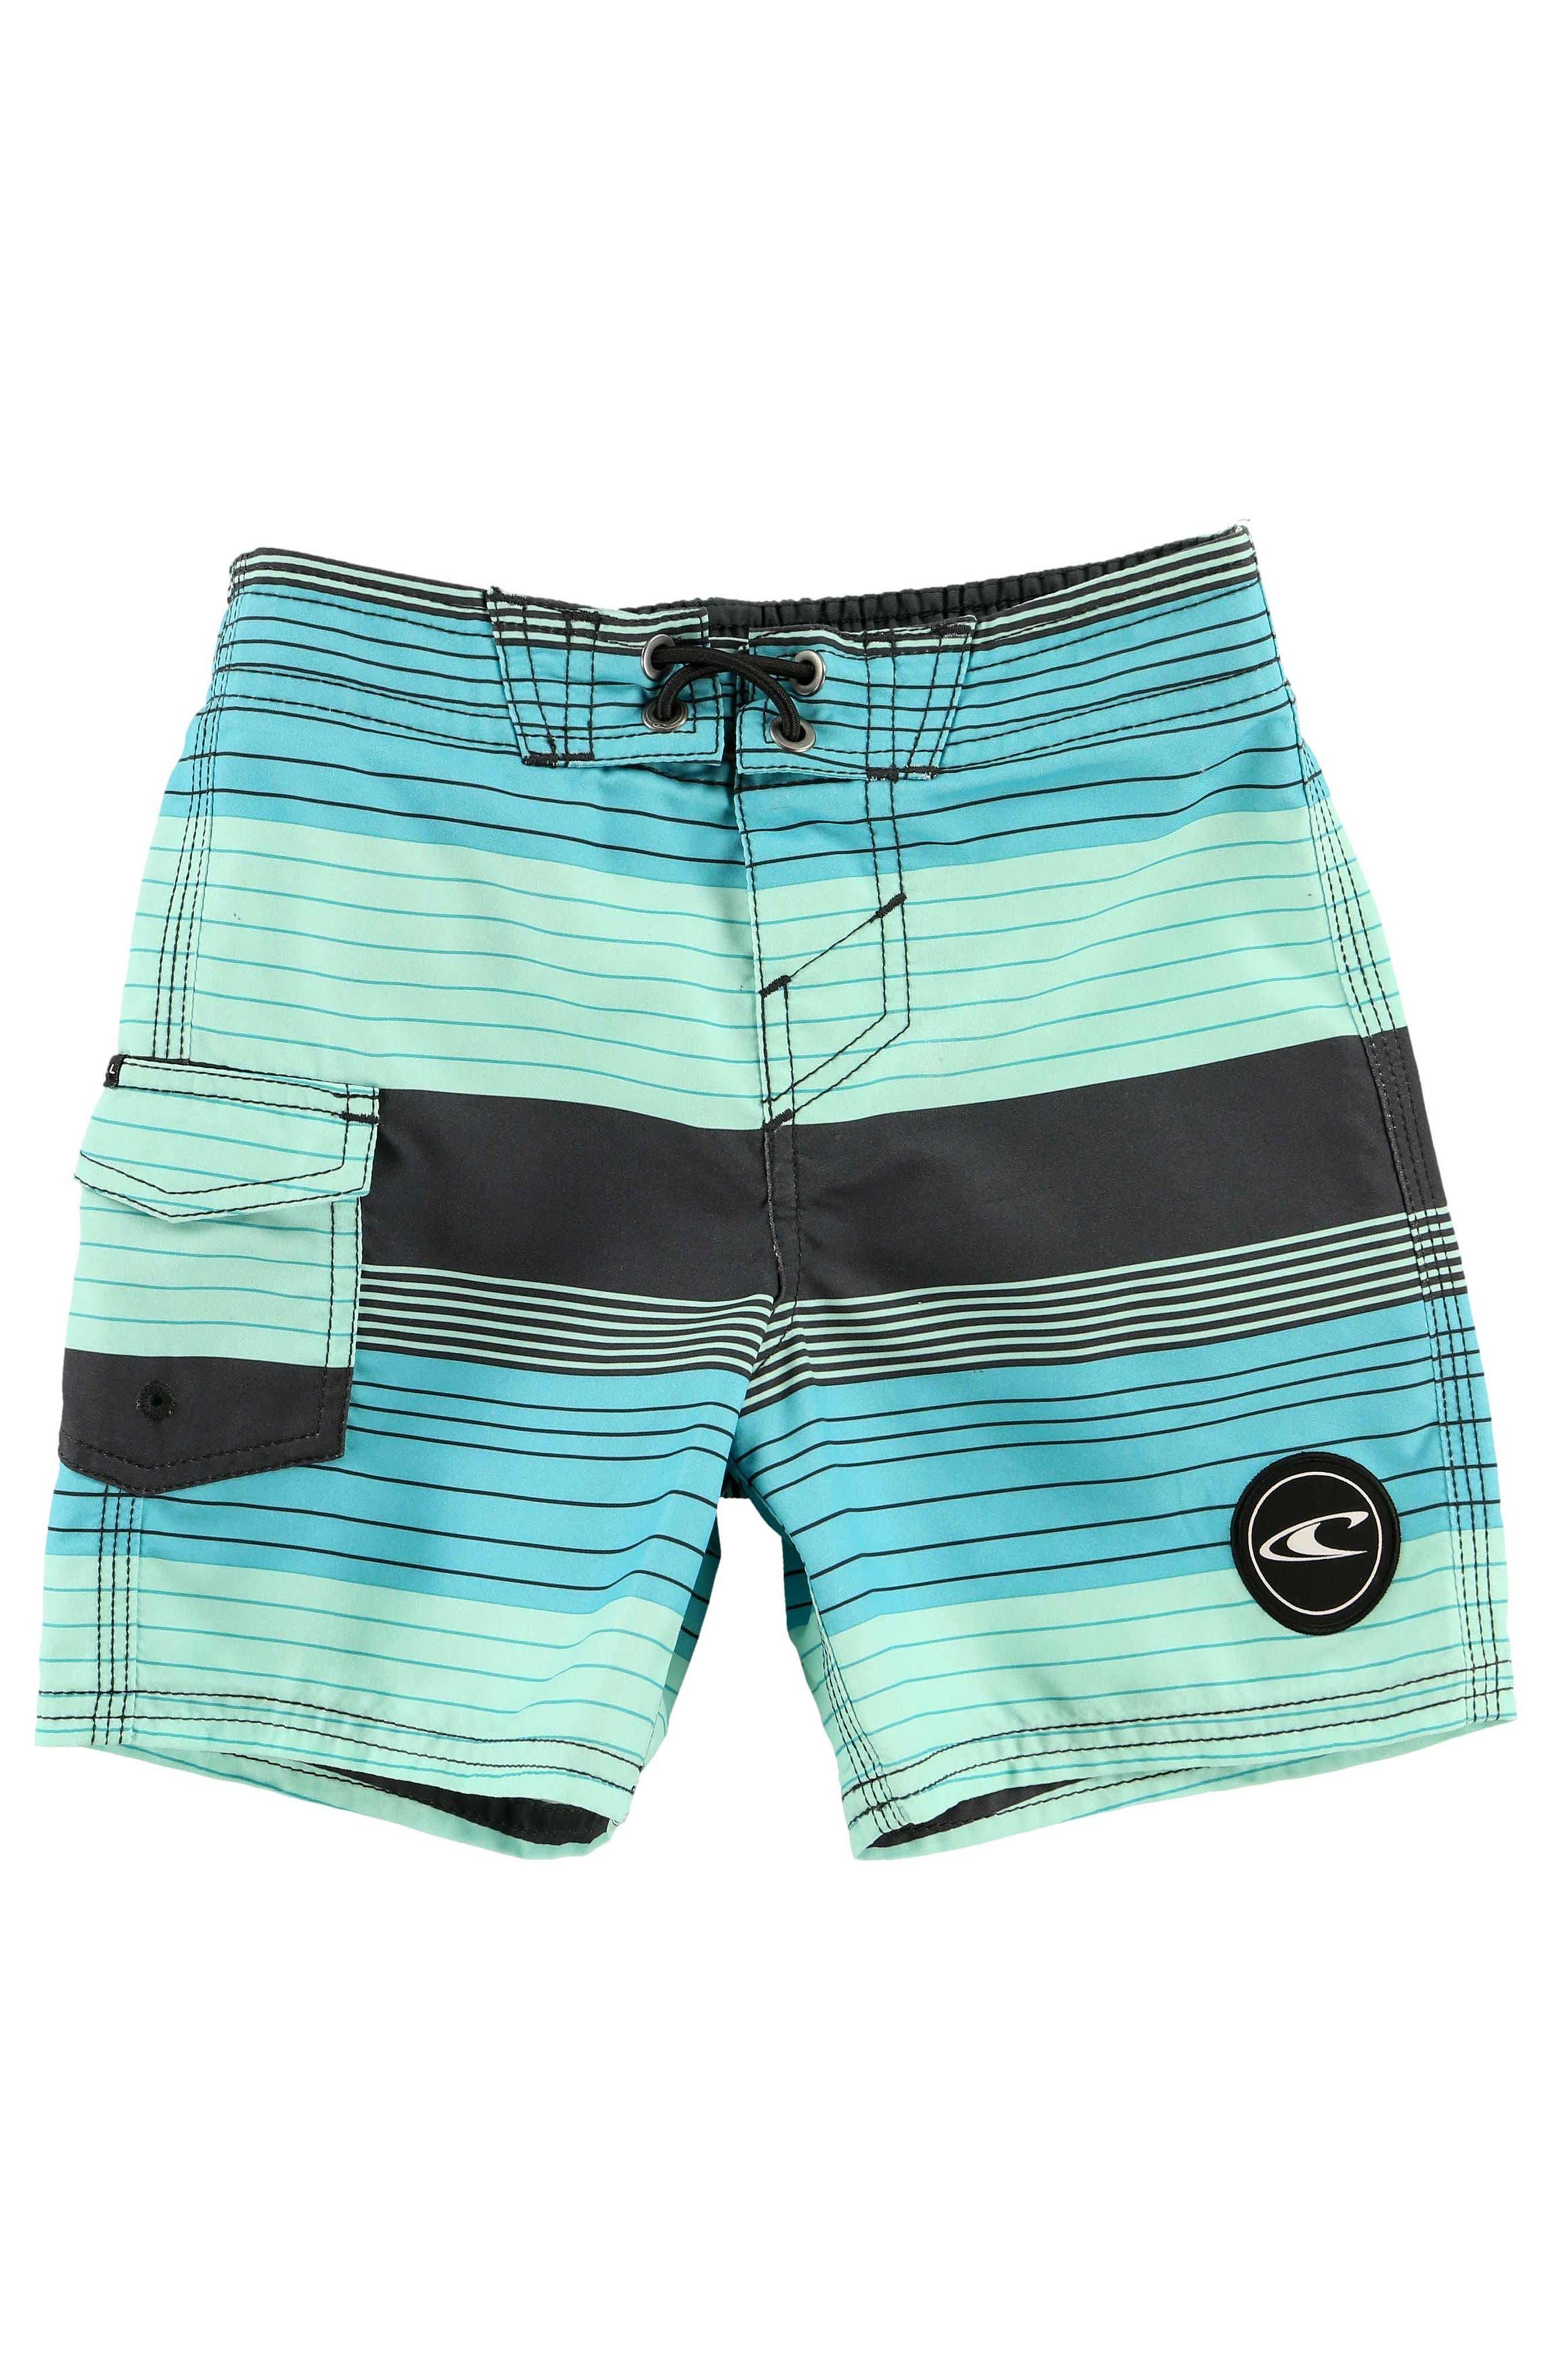 ONEILL Santa Cruz Stripe Board Shorts